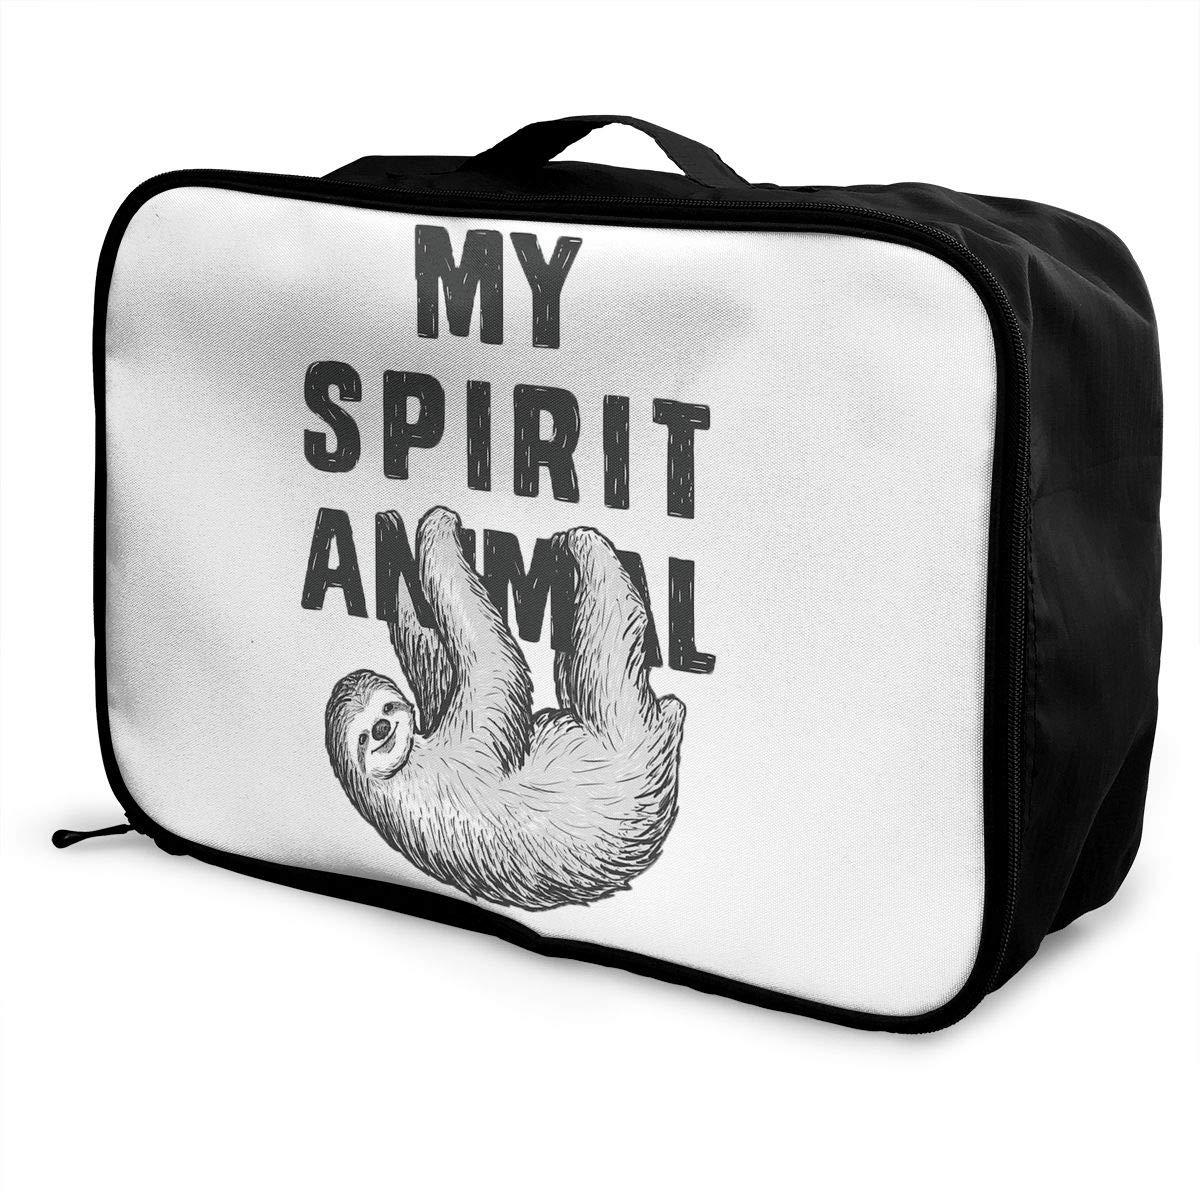 YueLJB My Spirit Animal Sloth Lightweight Large Capacity Portable Luggage Bag Travel Duffel Bag Storage Carry Luggage Duffle Tote Bag